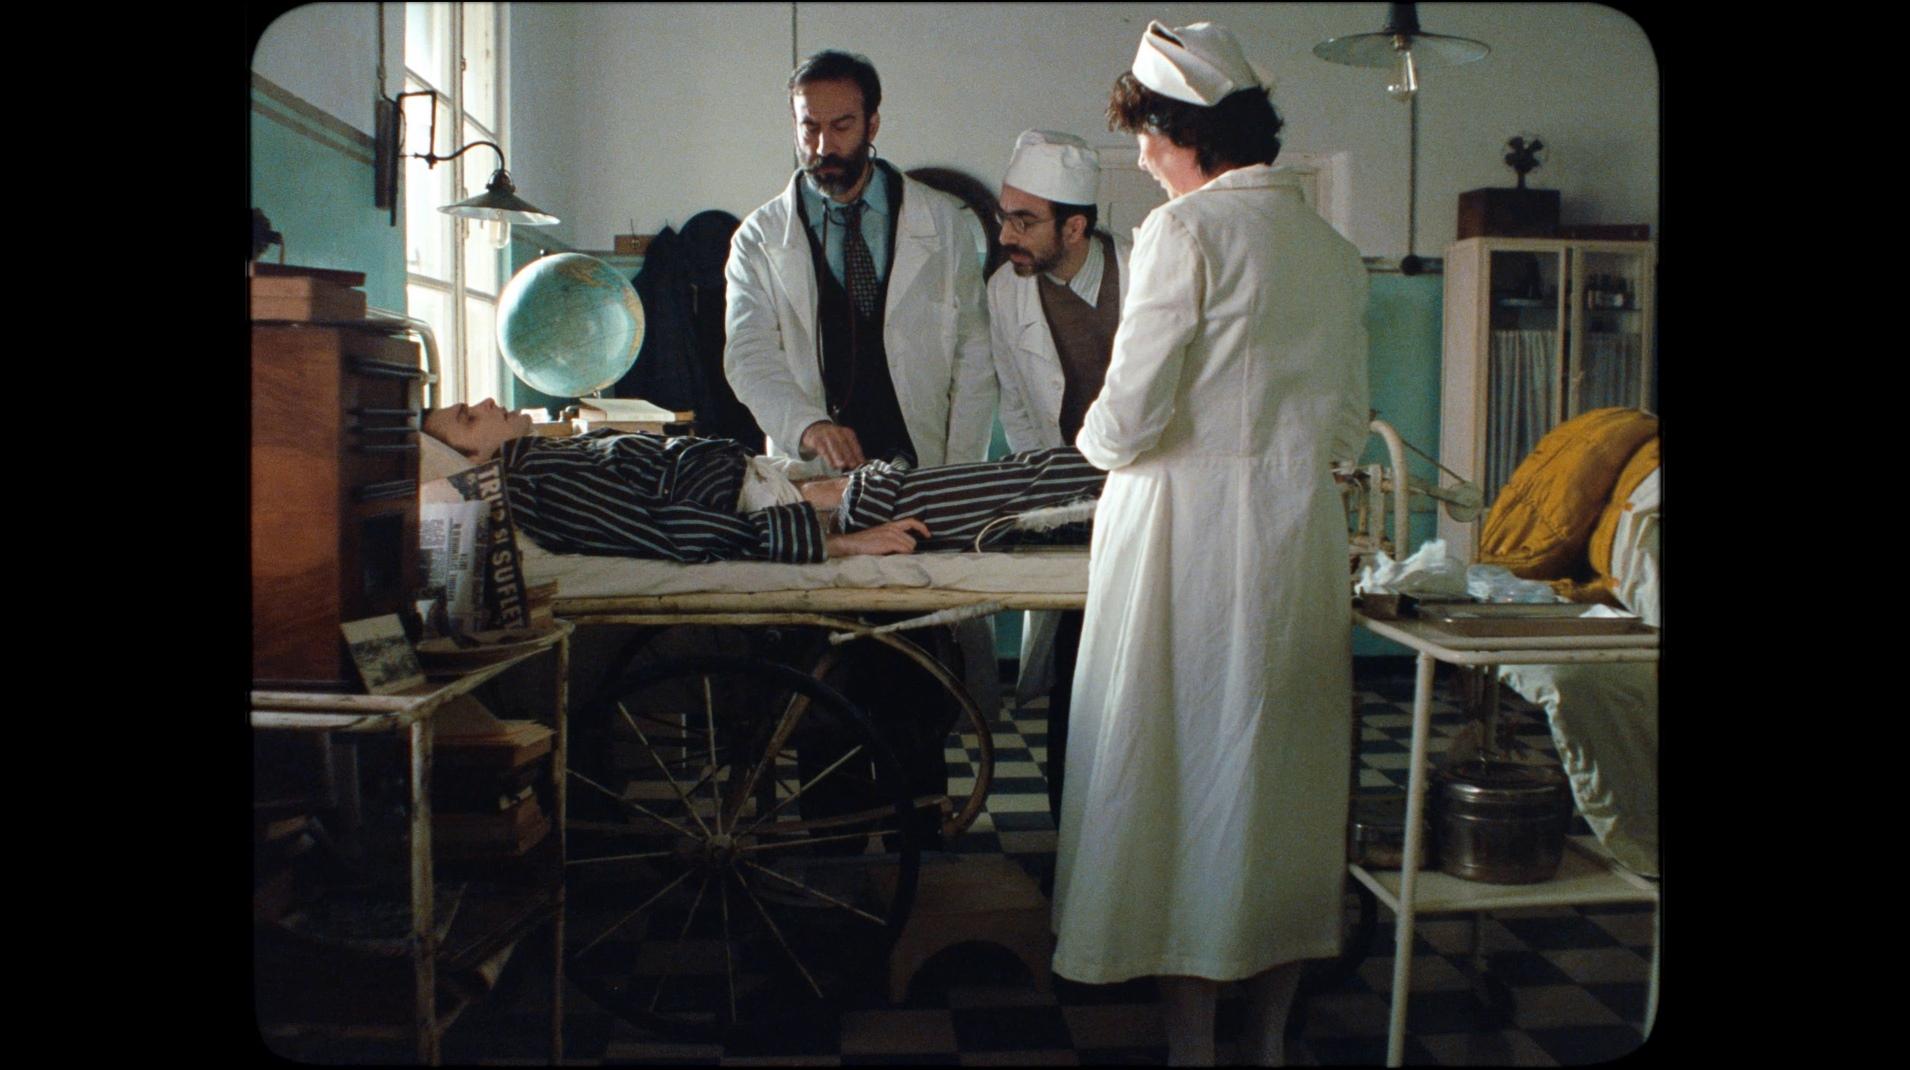 scarred-hearts-inimi-cicatrizate-maren-ade-radu-jude-lucian-teodor-rus-ivana-mladenovic487-ilinca-harnut-3